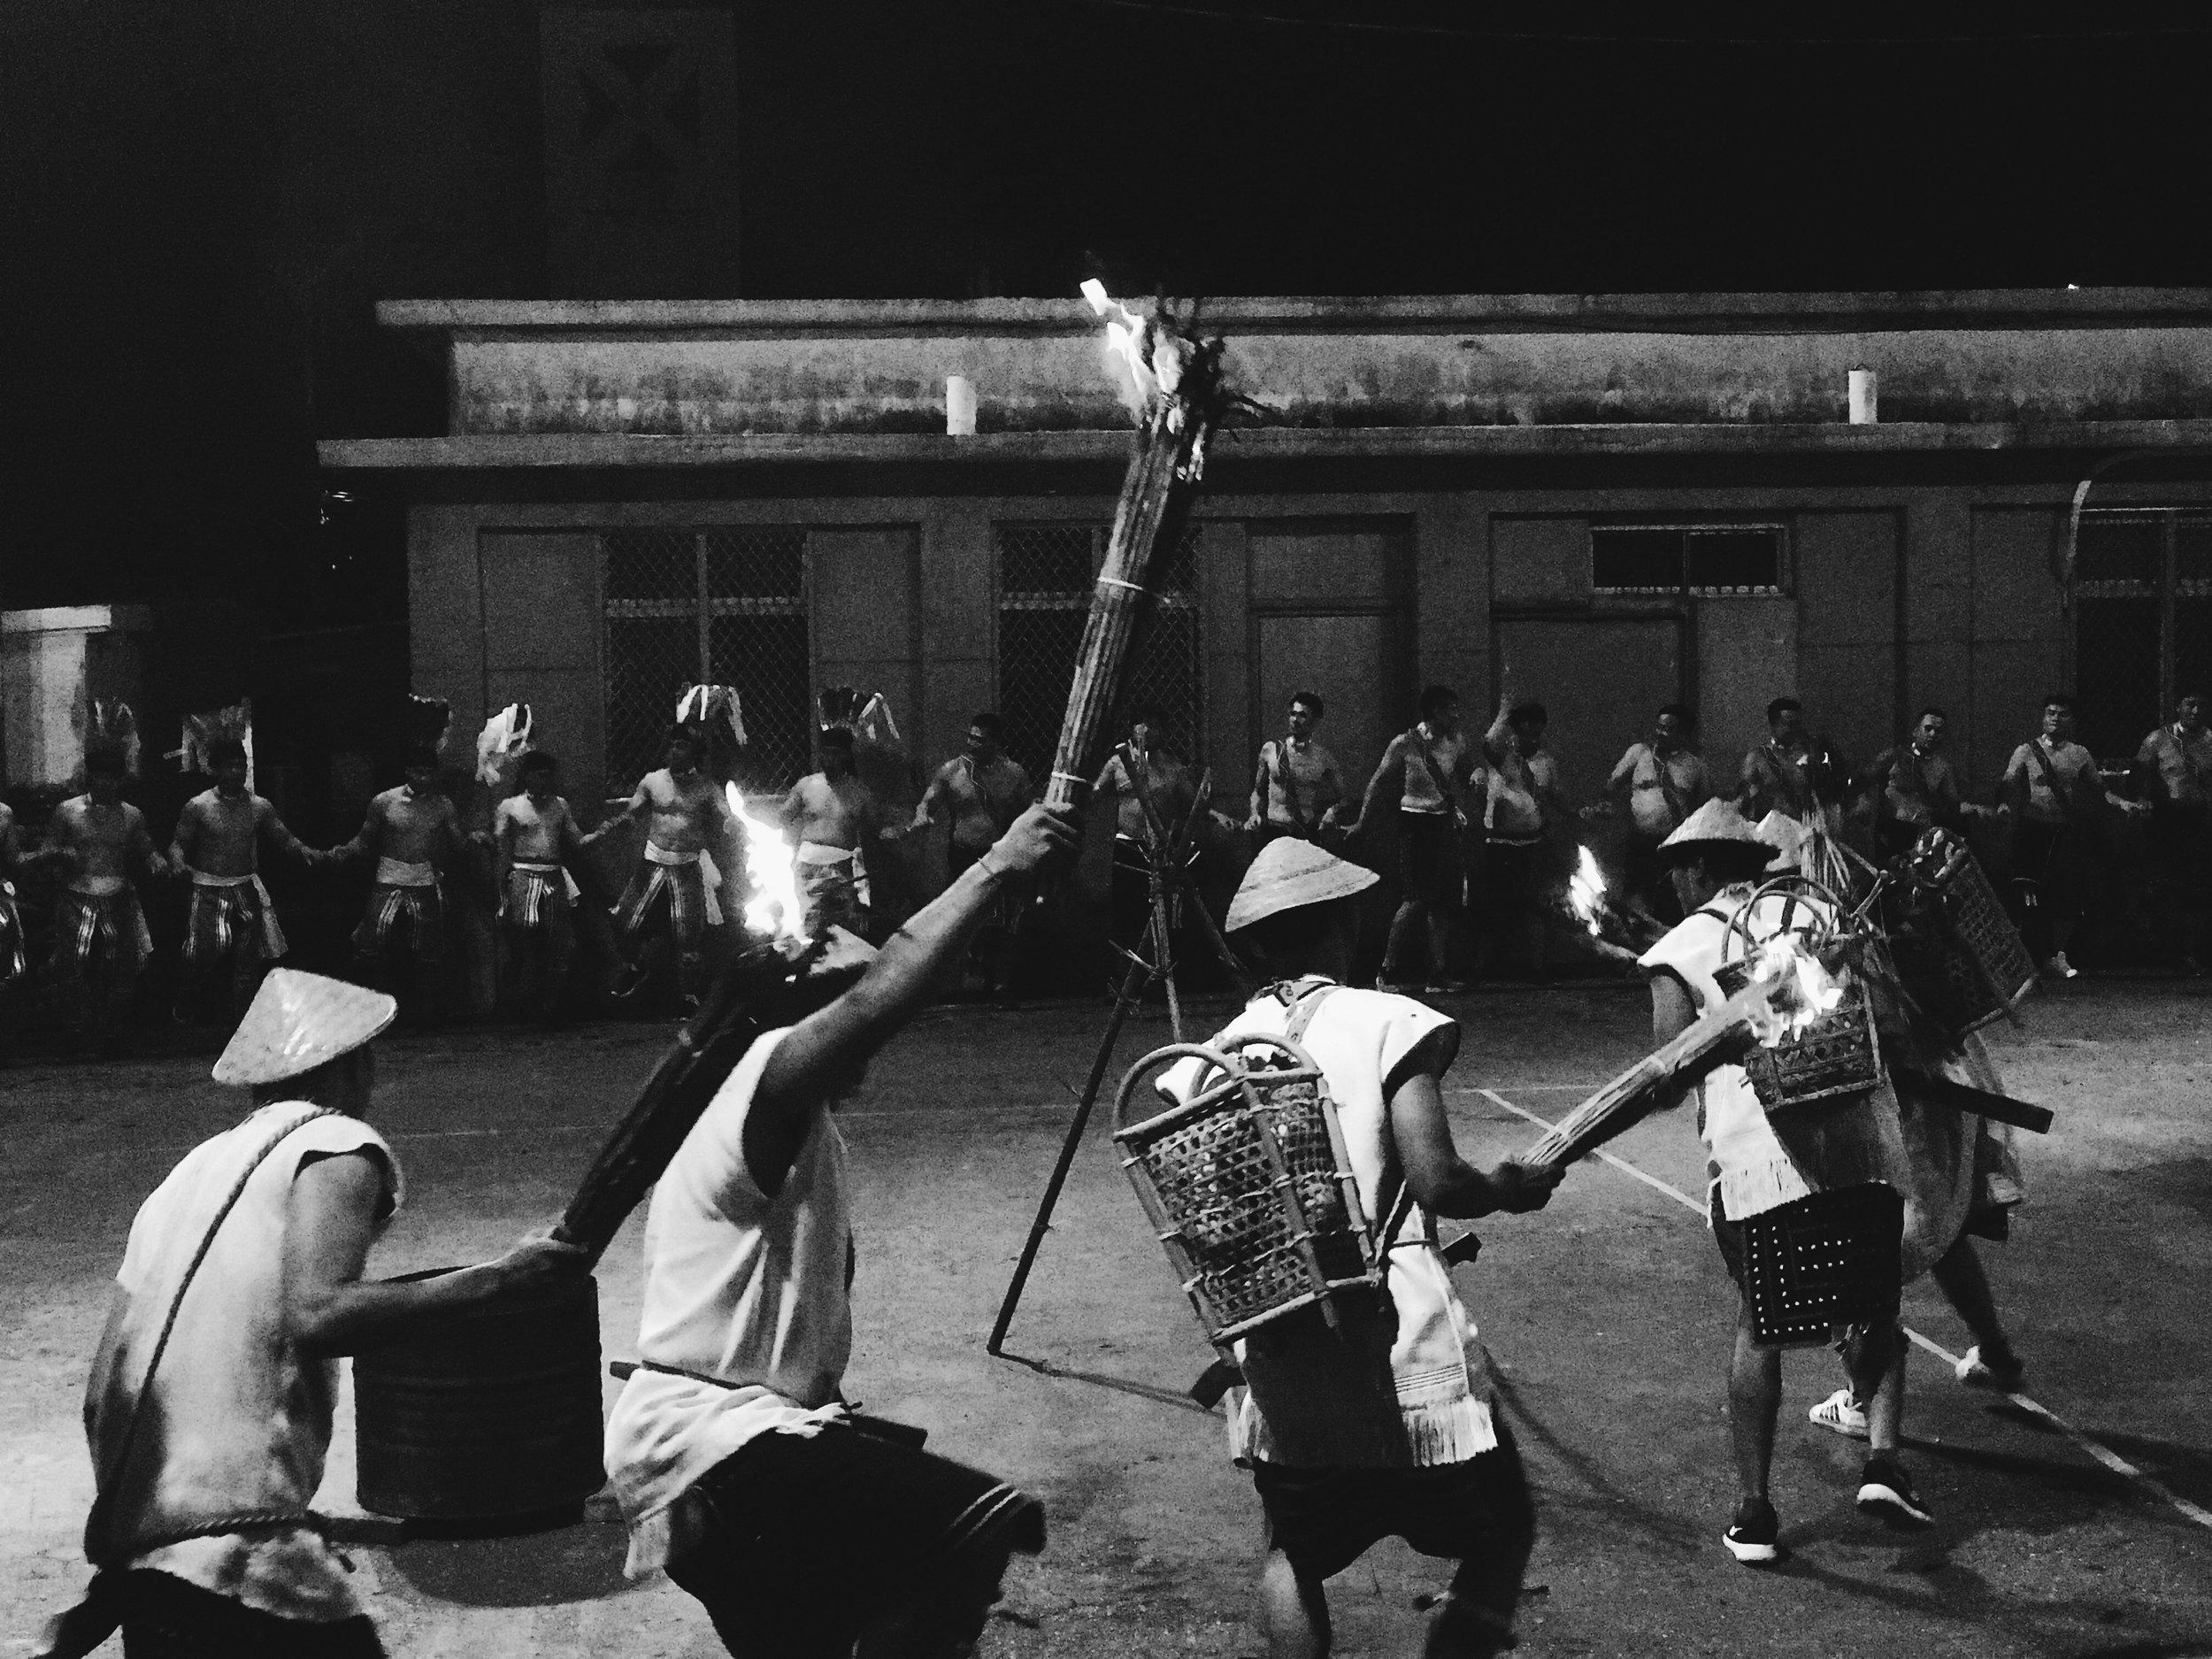 miaoaoway 在祭典時所著裝的樣貌